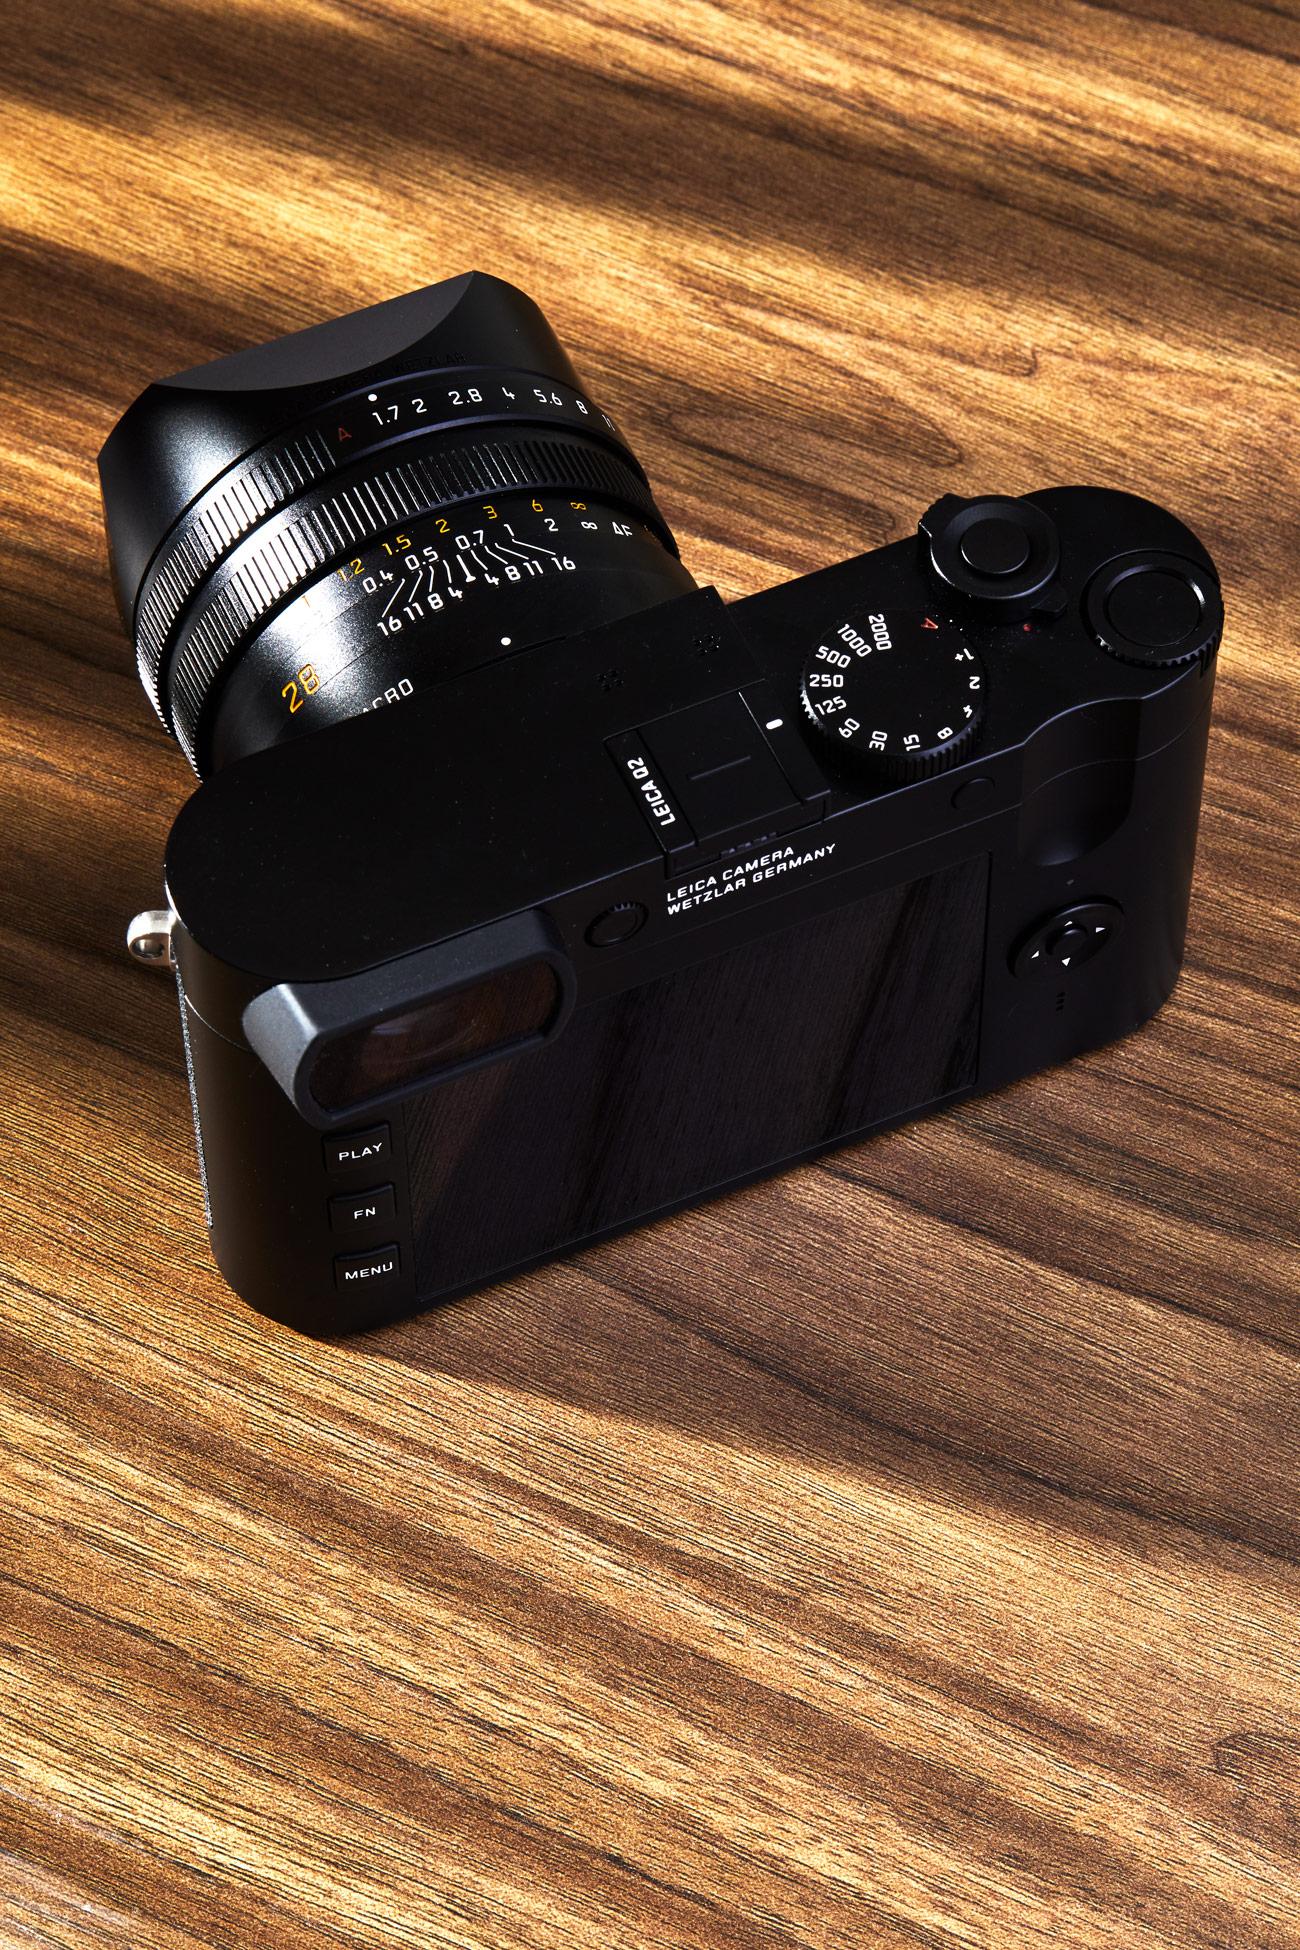 Leica Q2 Review Back